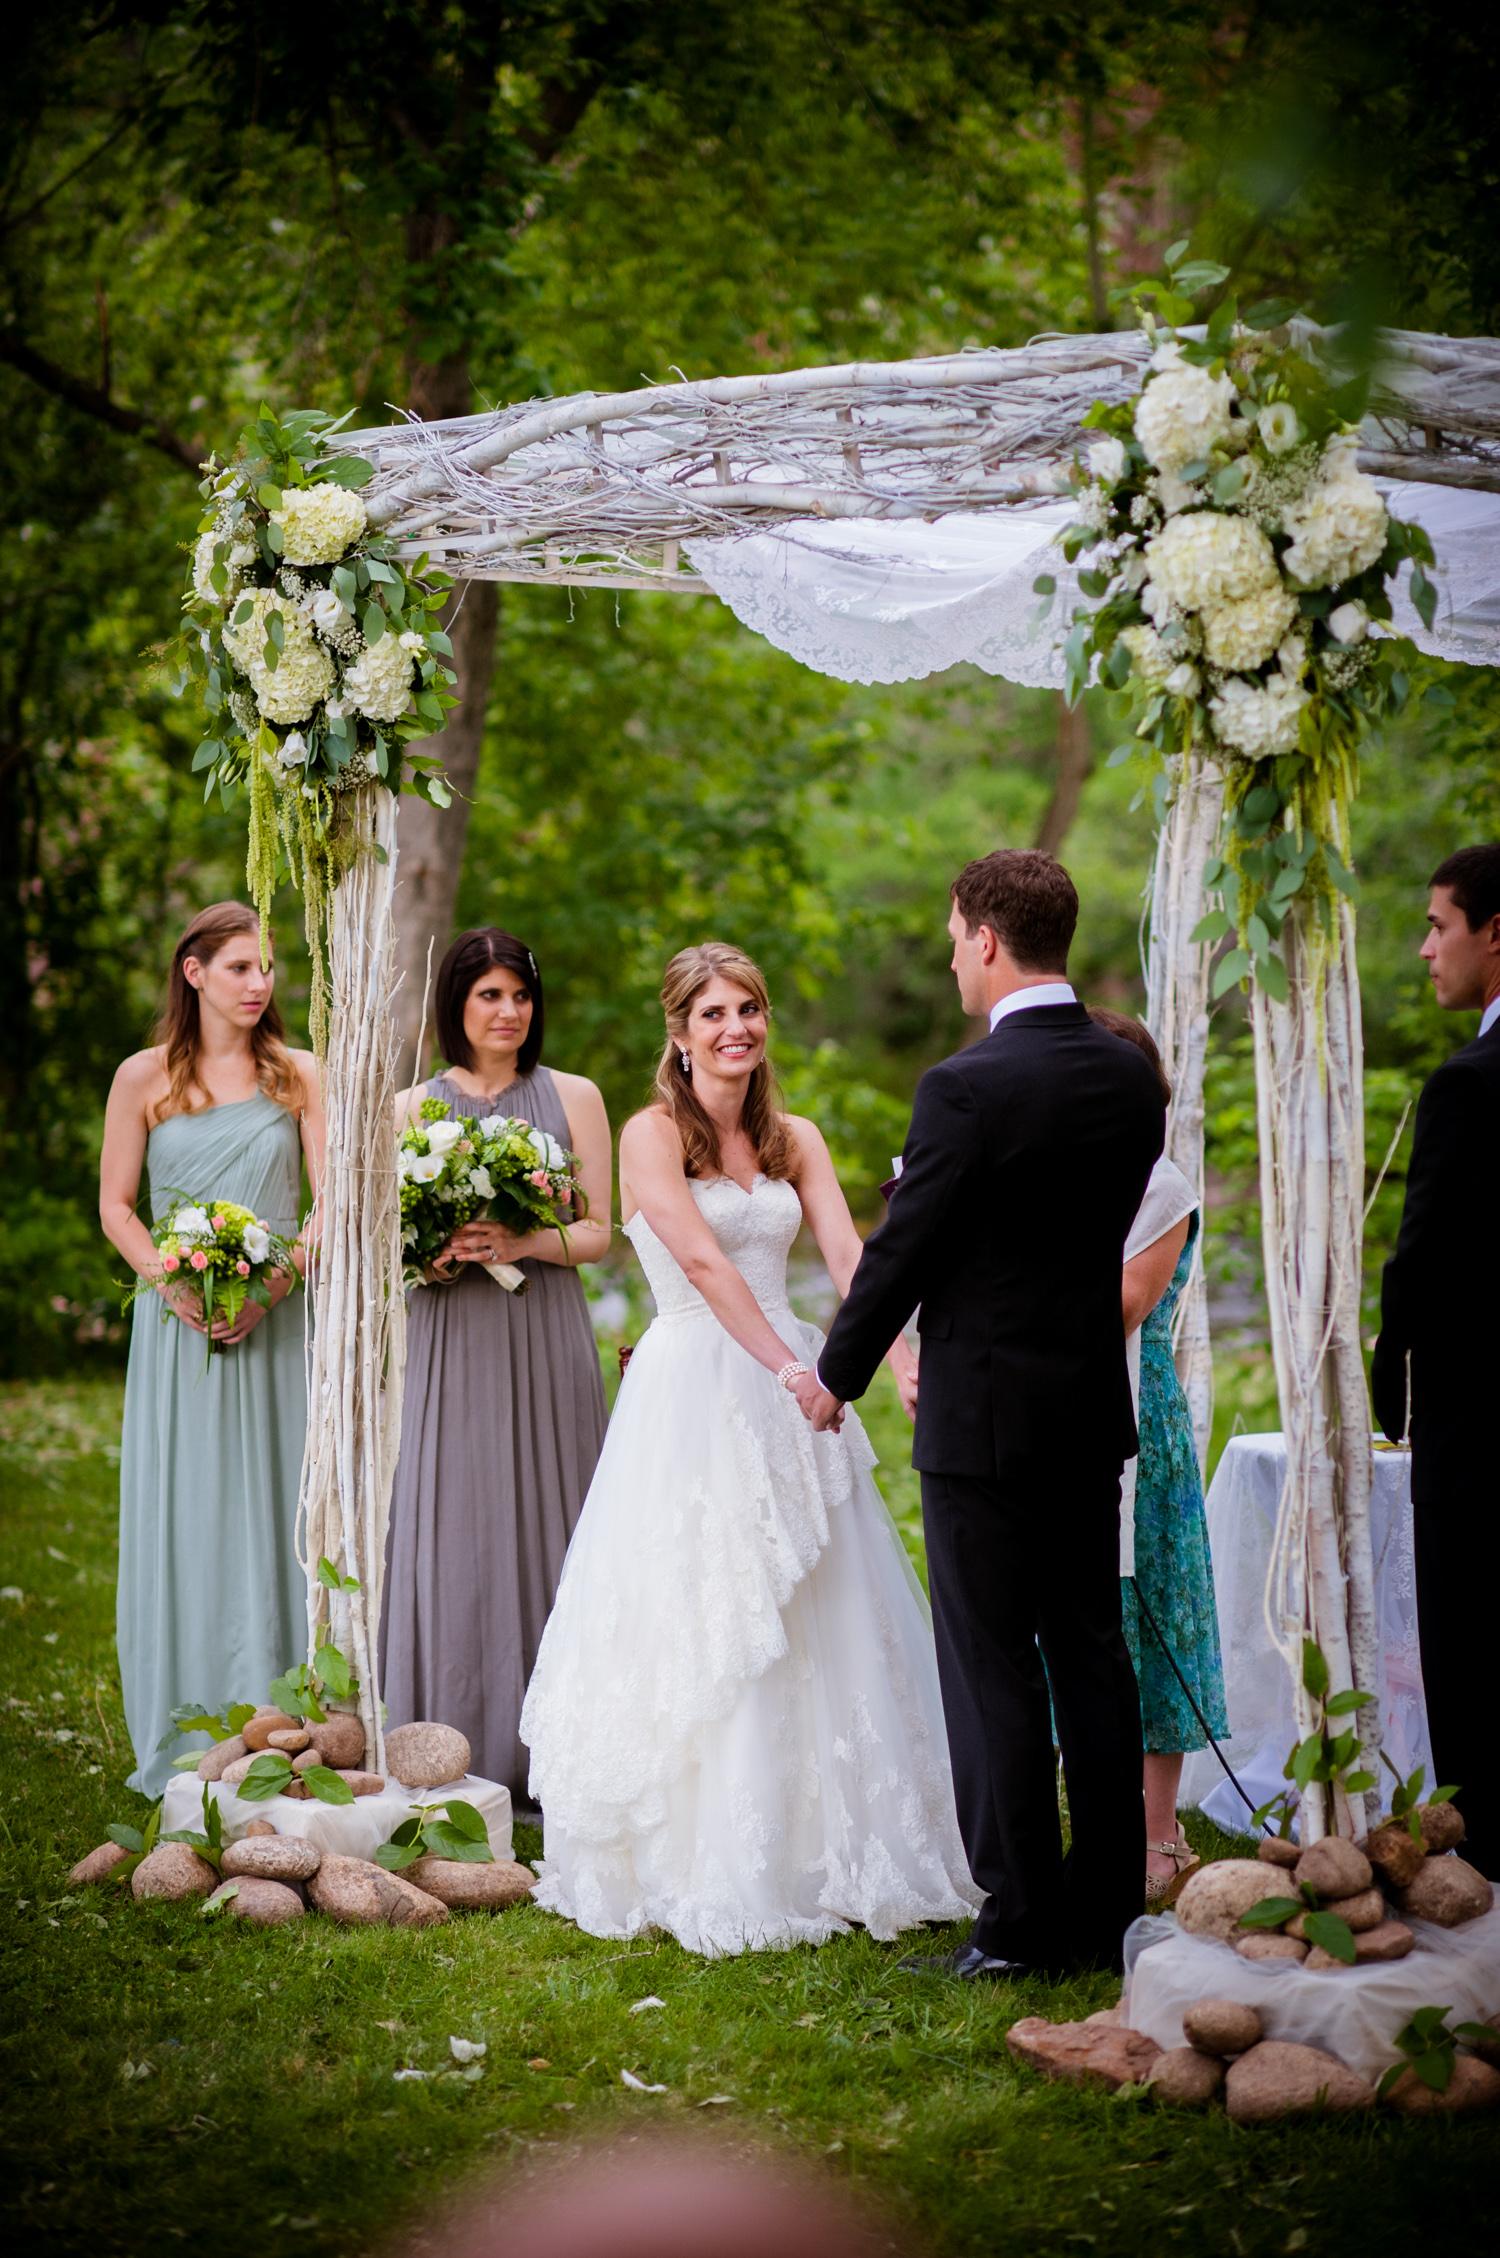 Planet_Bluegrass_Lyons_Wedding_051.JPG